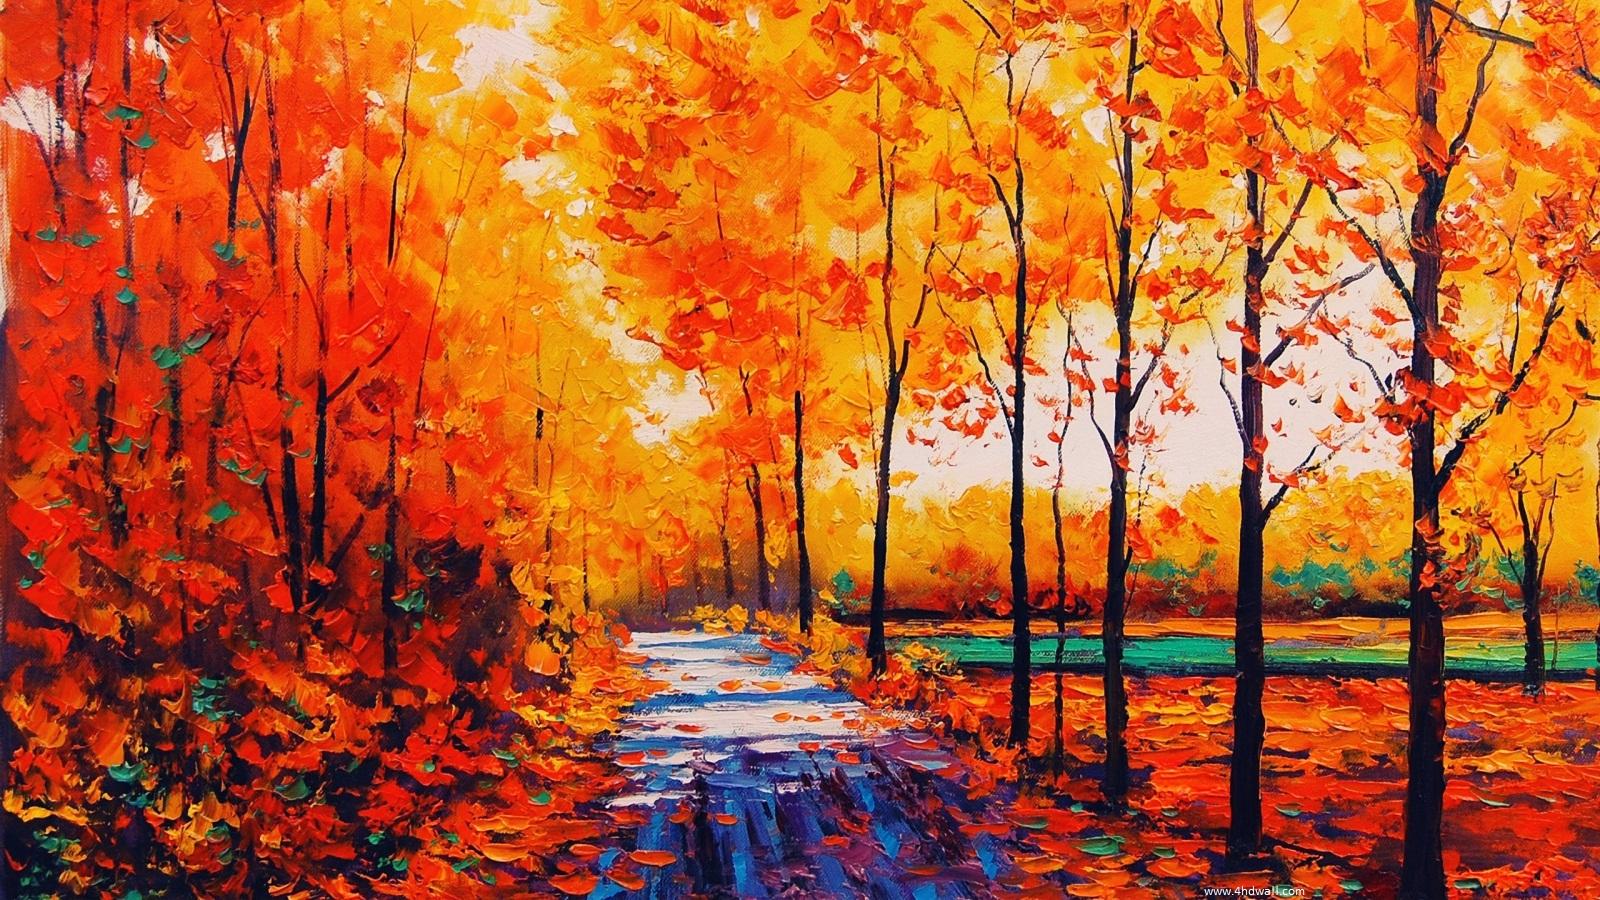 Fall Season Desktop Background HD wallpaper background 1600x900